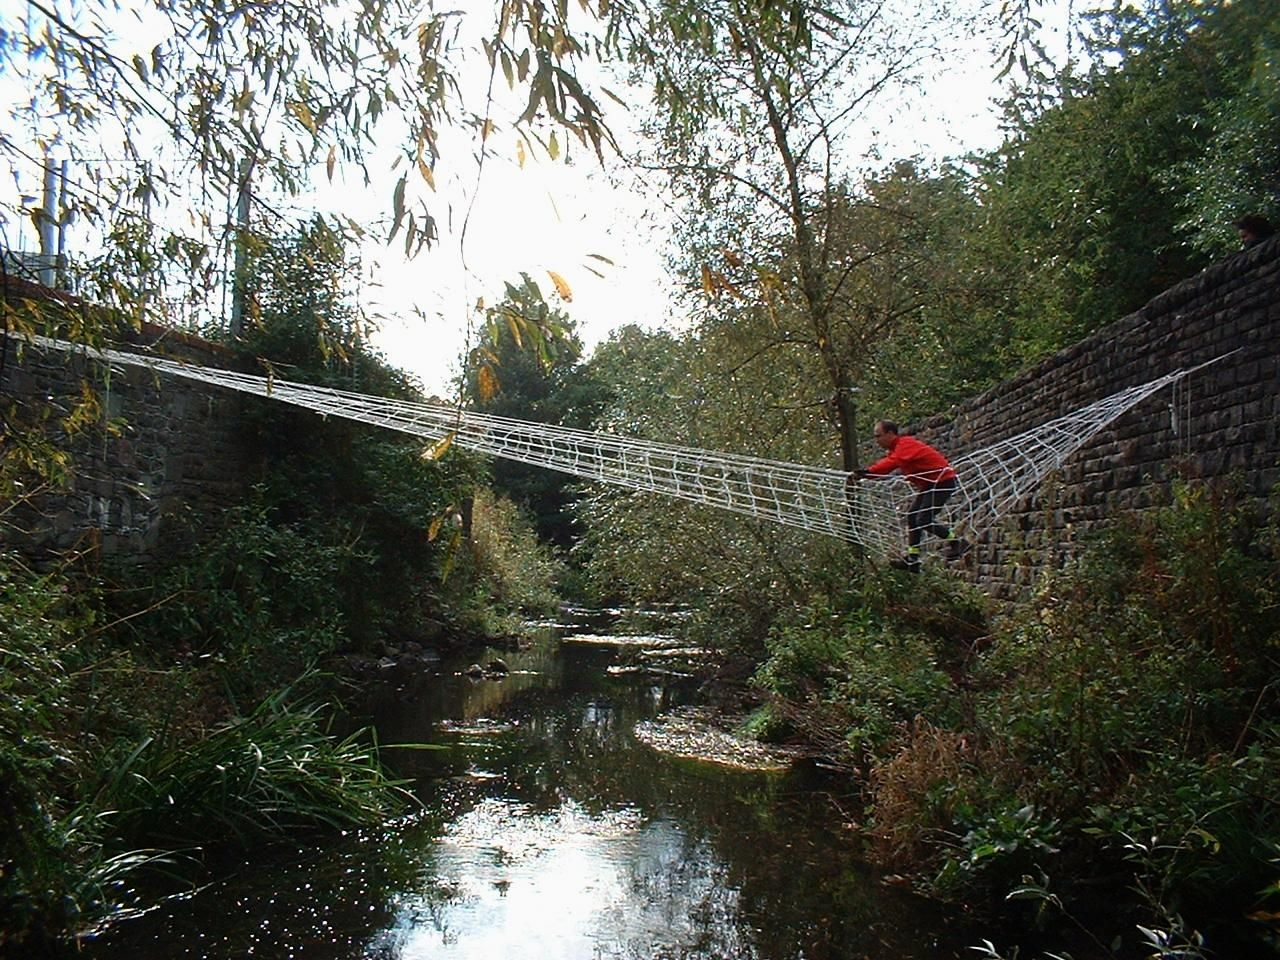 Pin By Phyllis Muller On Garden Paths Rope Bridge